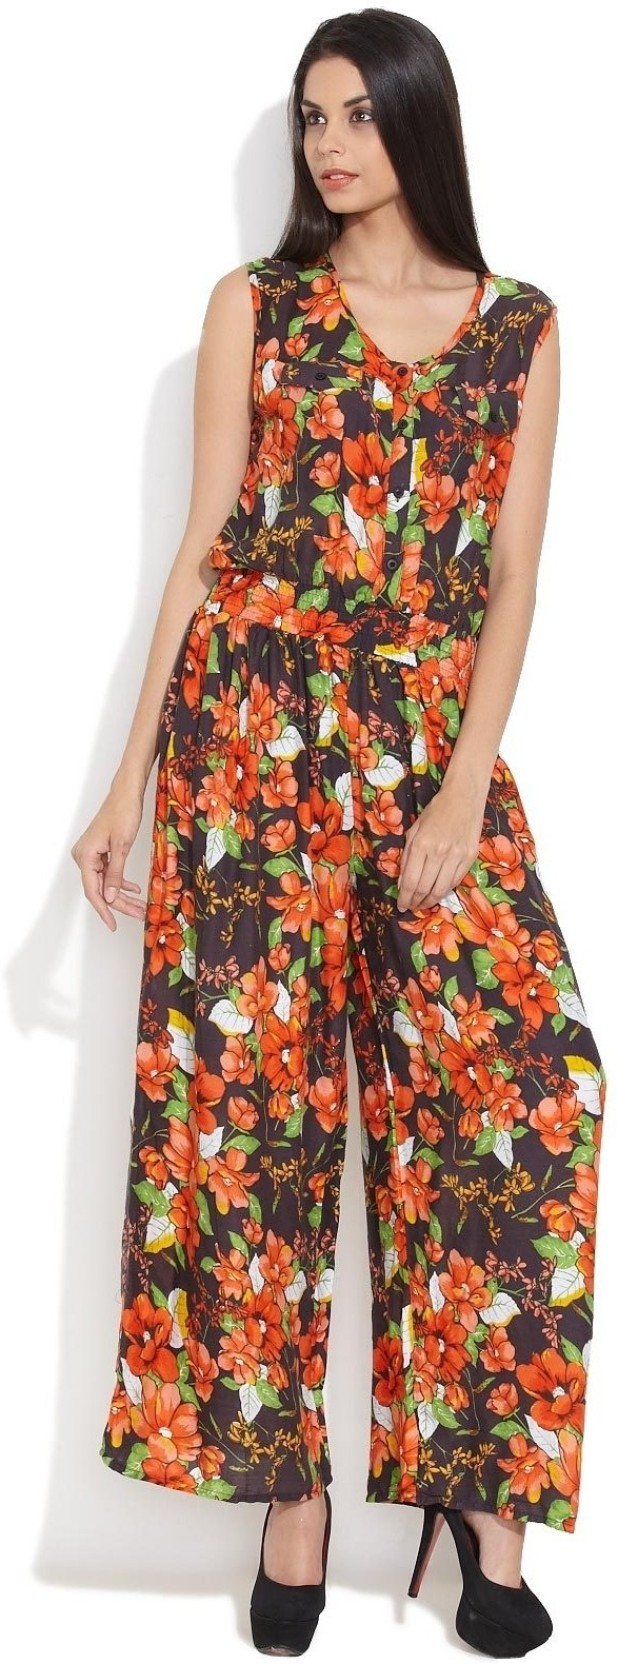 cd6c3c01db Hot Berries Floral Print Women s Jumpsuit - Buy Multicolor Hot ...